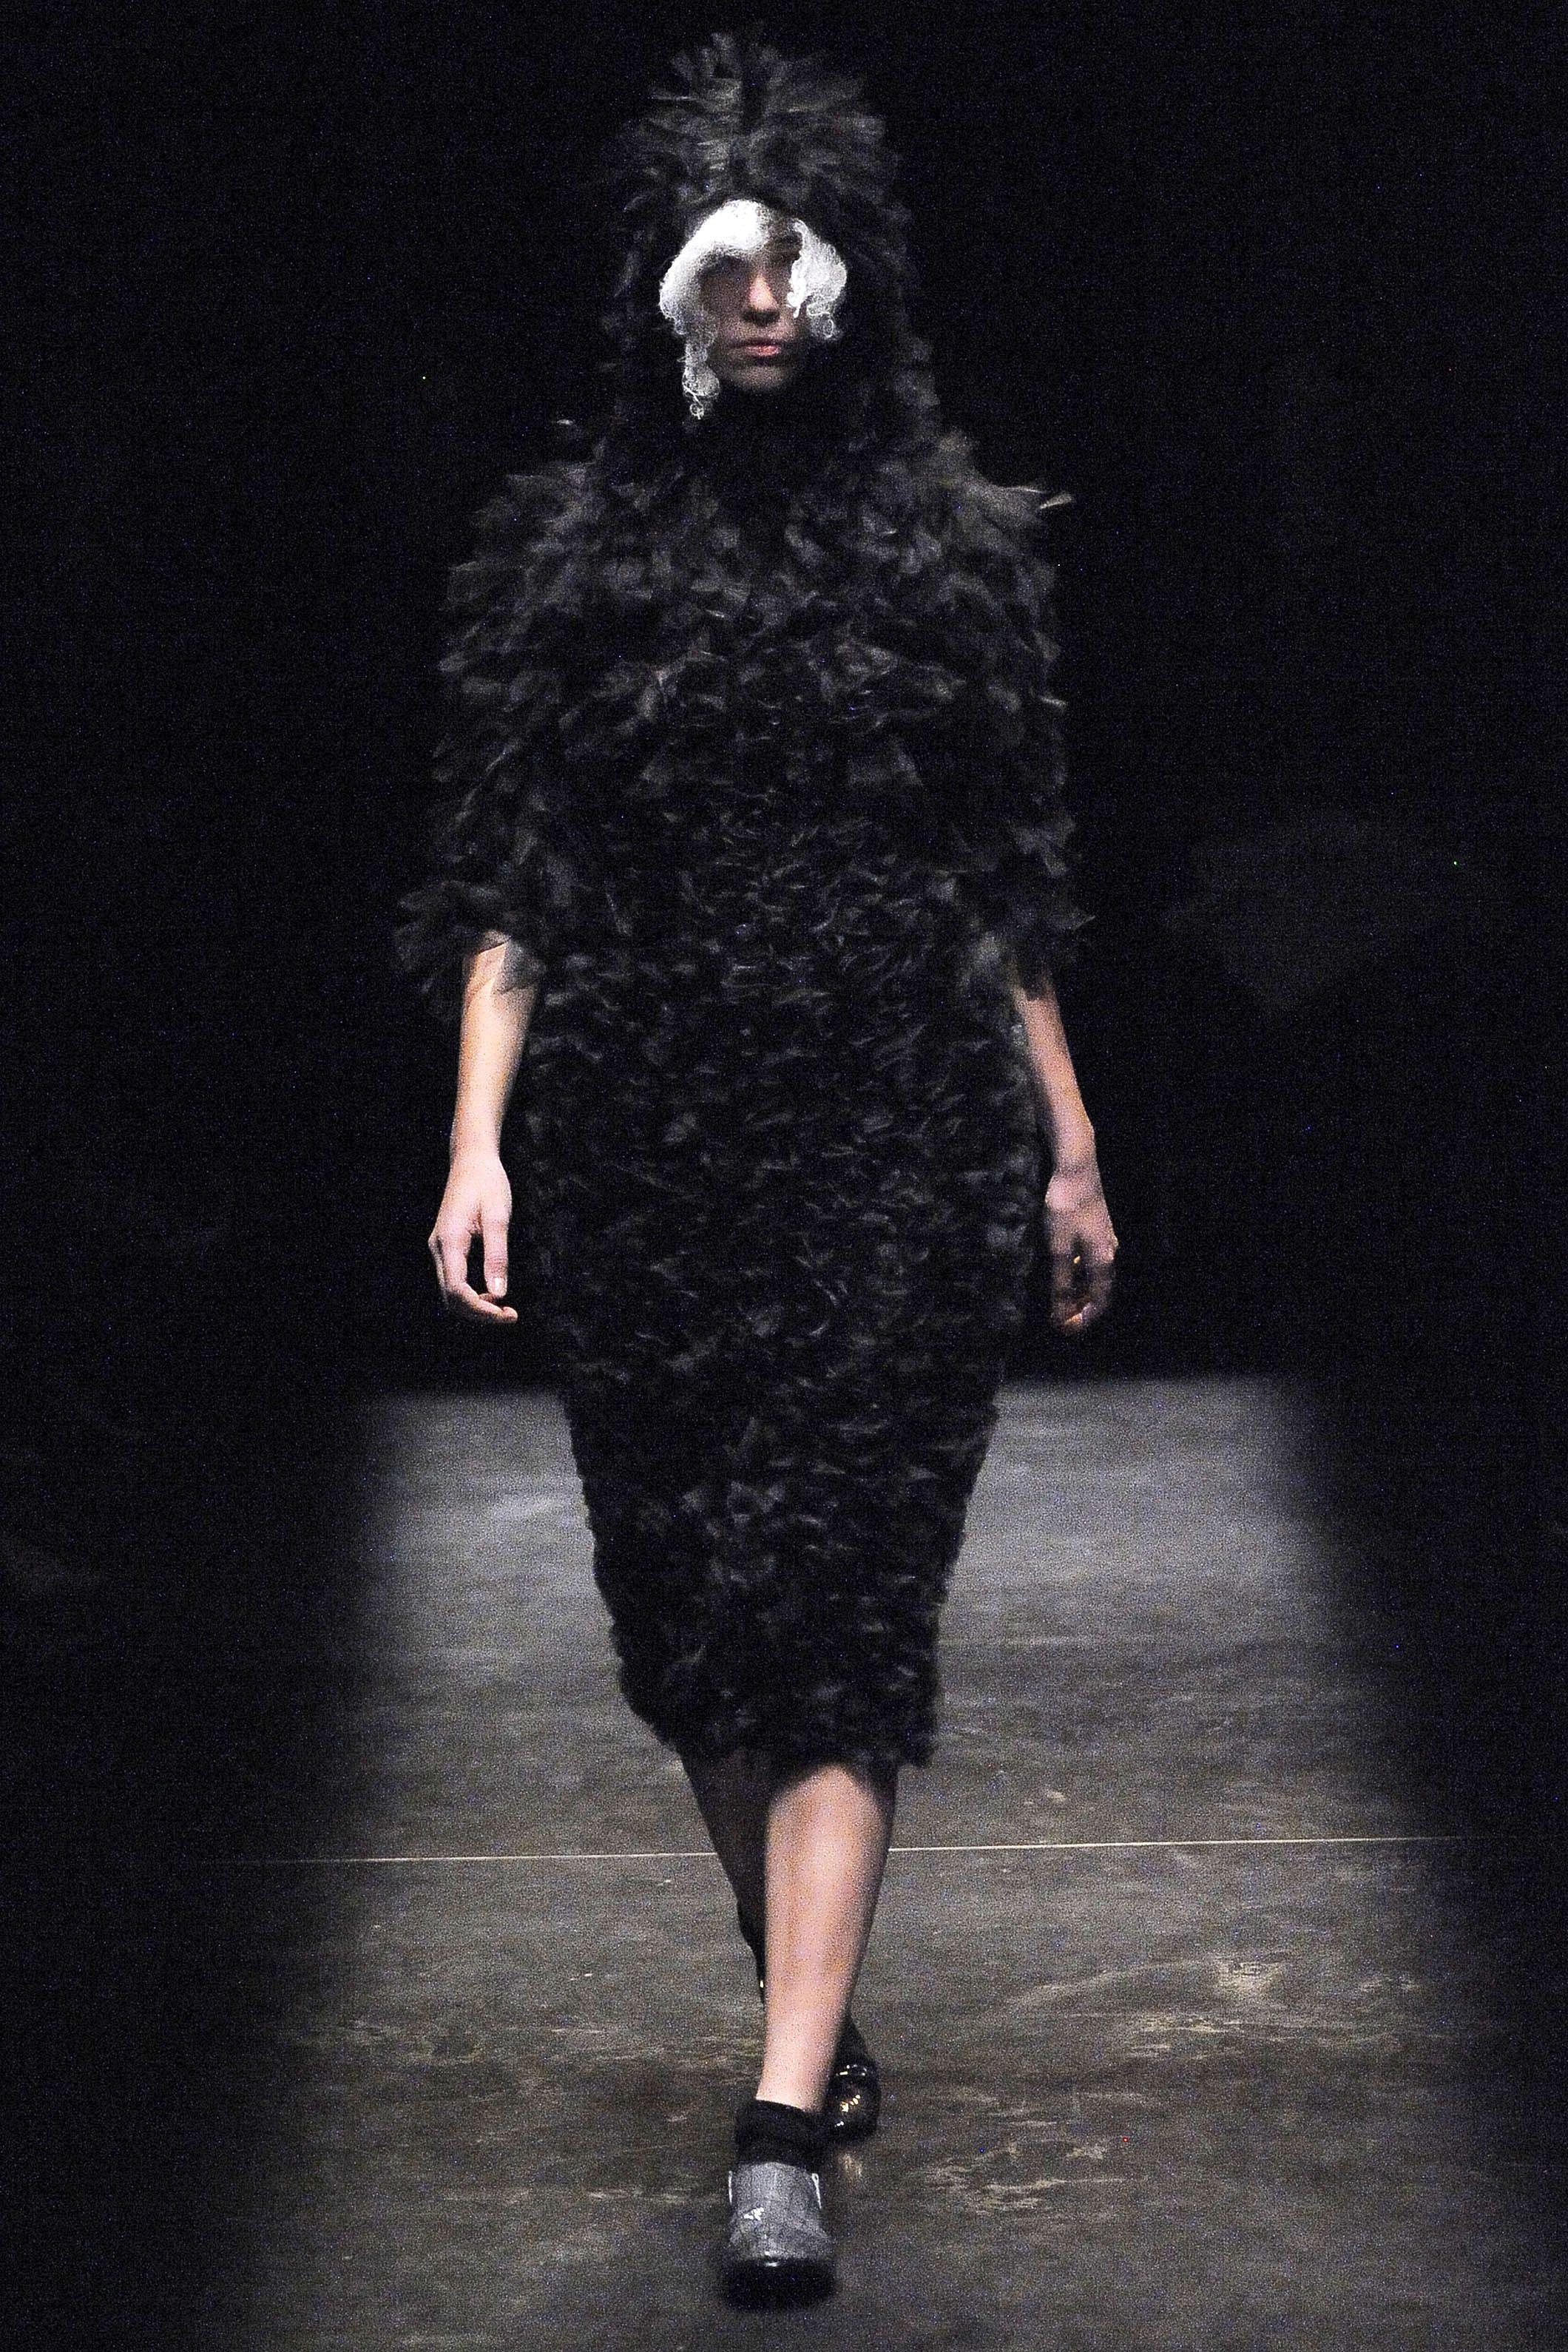 Sfilata Comme des Garçons Parigi - Collezioni Primavera Estate 2009 - Vogue